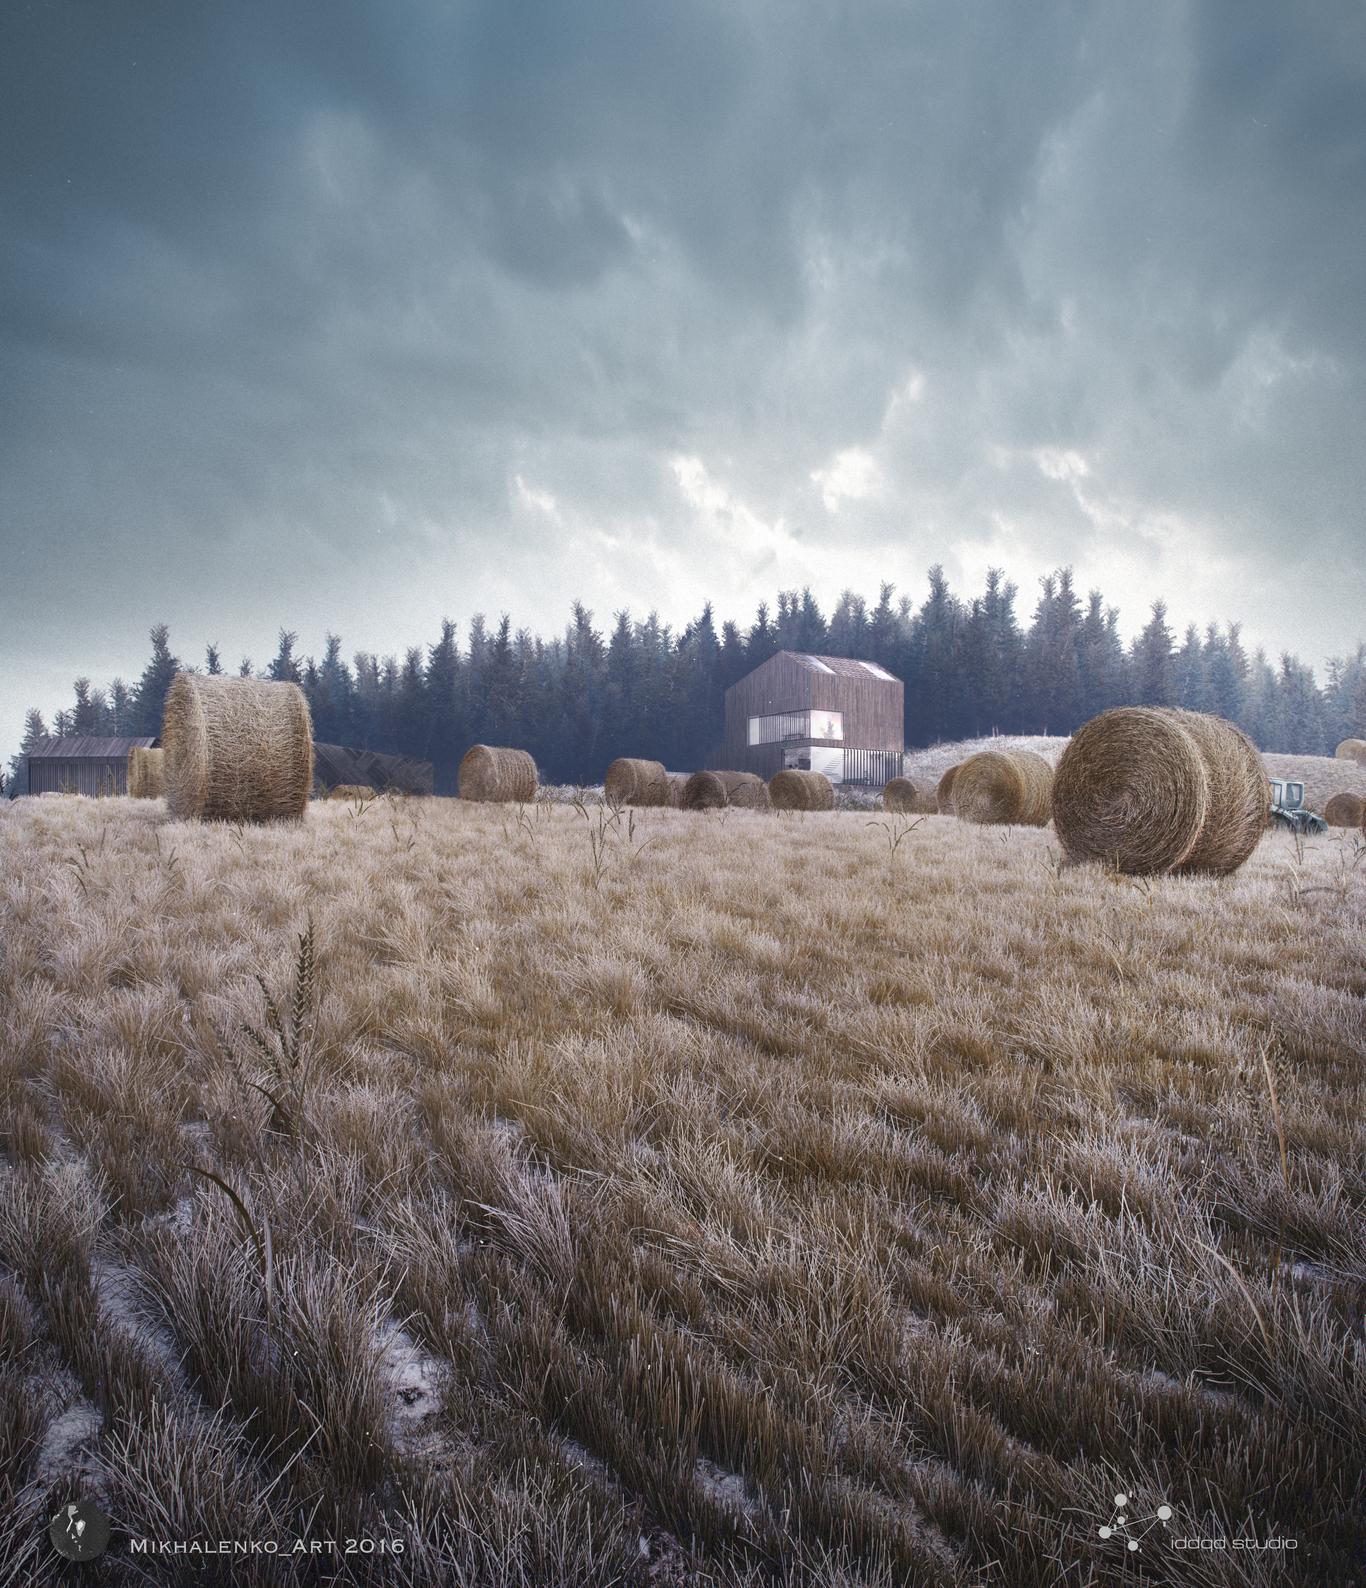 Mikhalenko winterhill 1 9addffe9 w9se